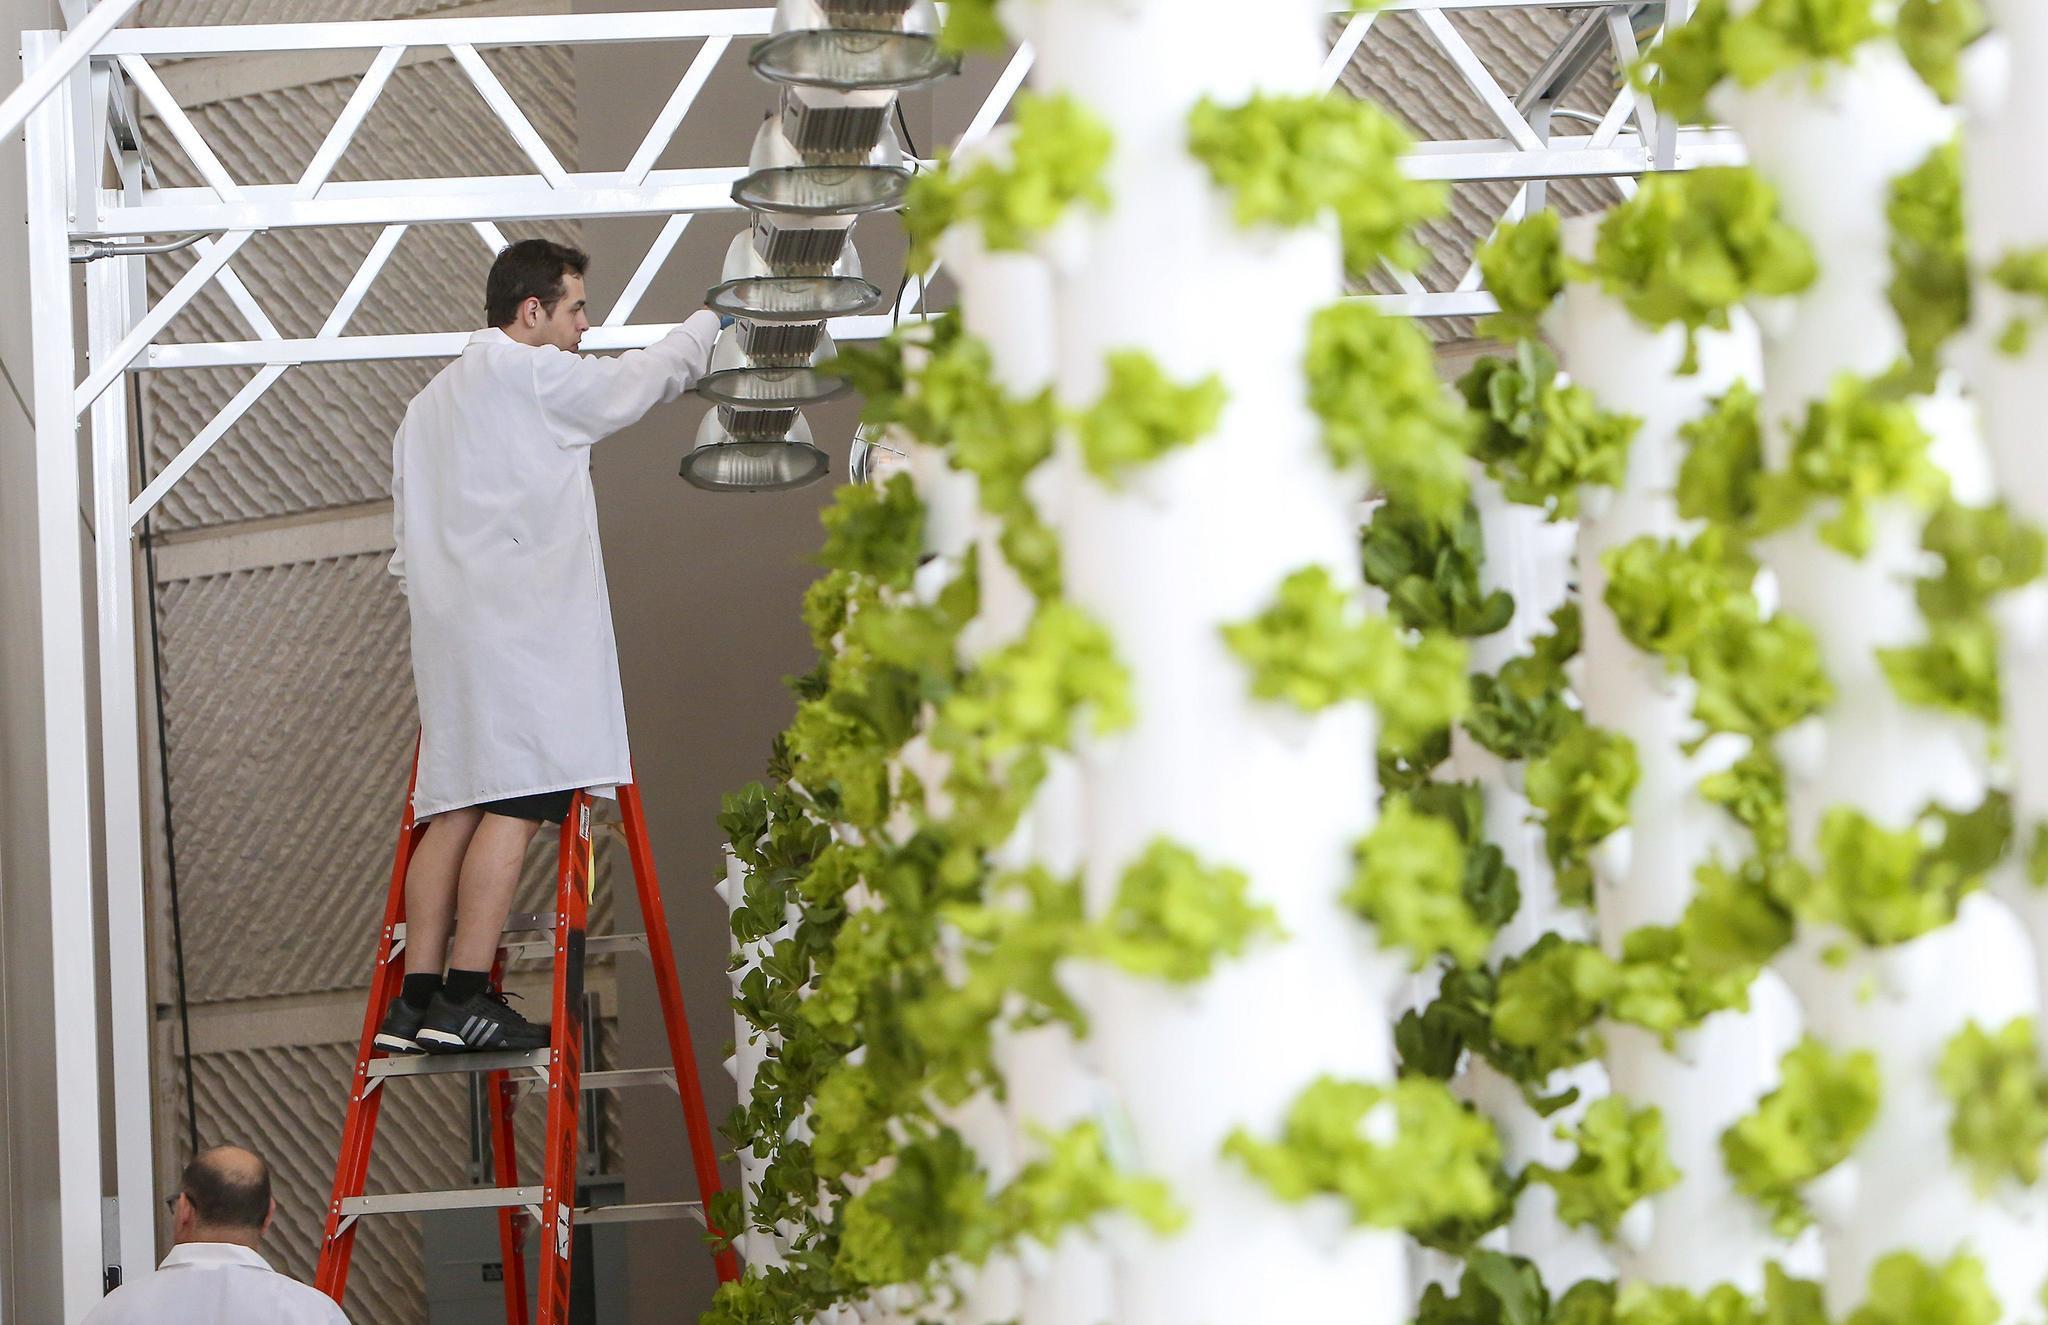 Orange County Convention Center Launches Urban Garden   Orlando Sentinel